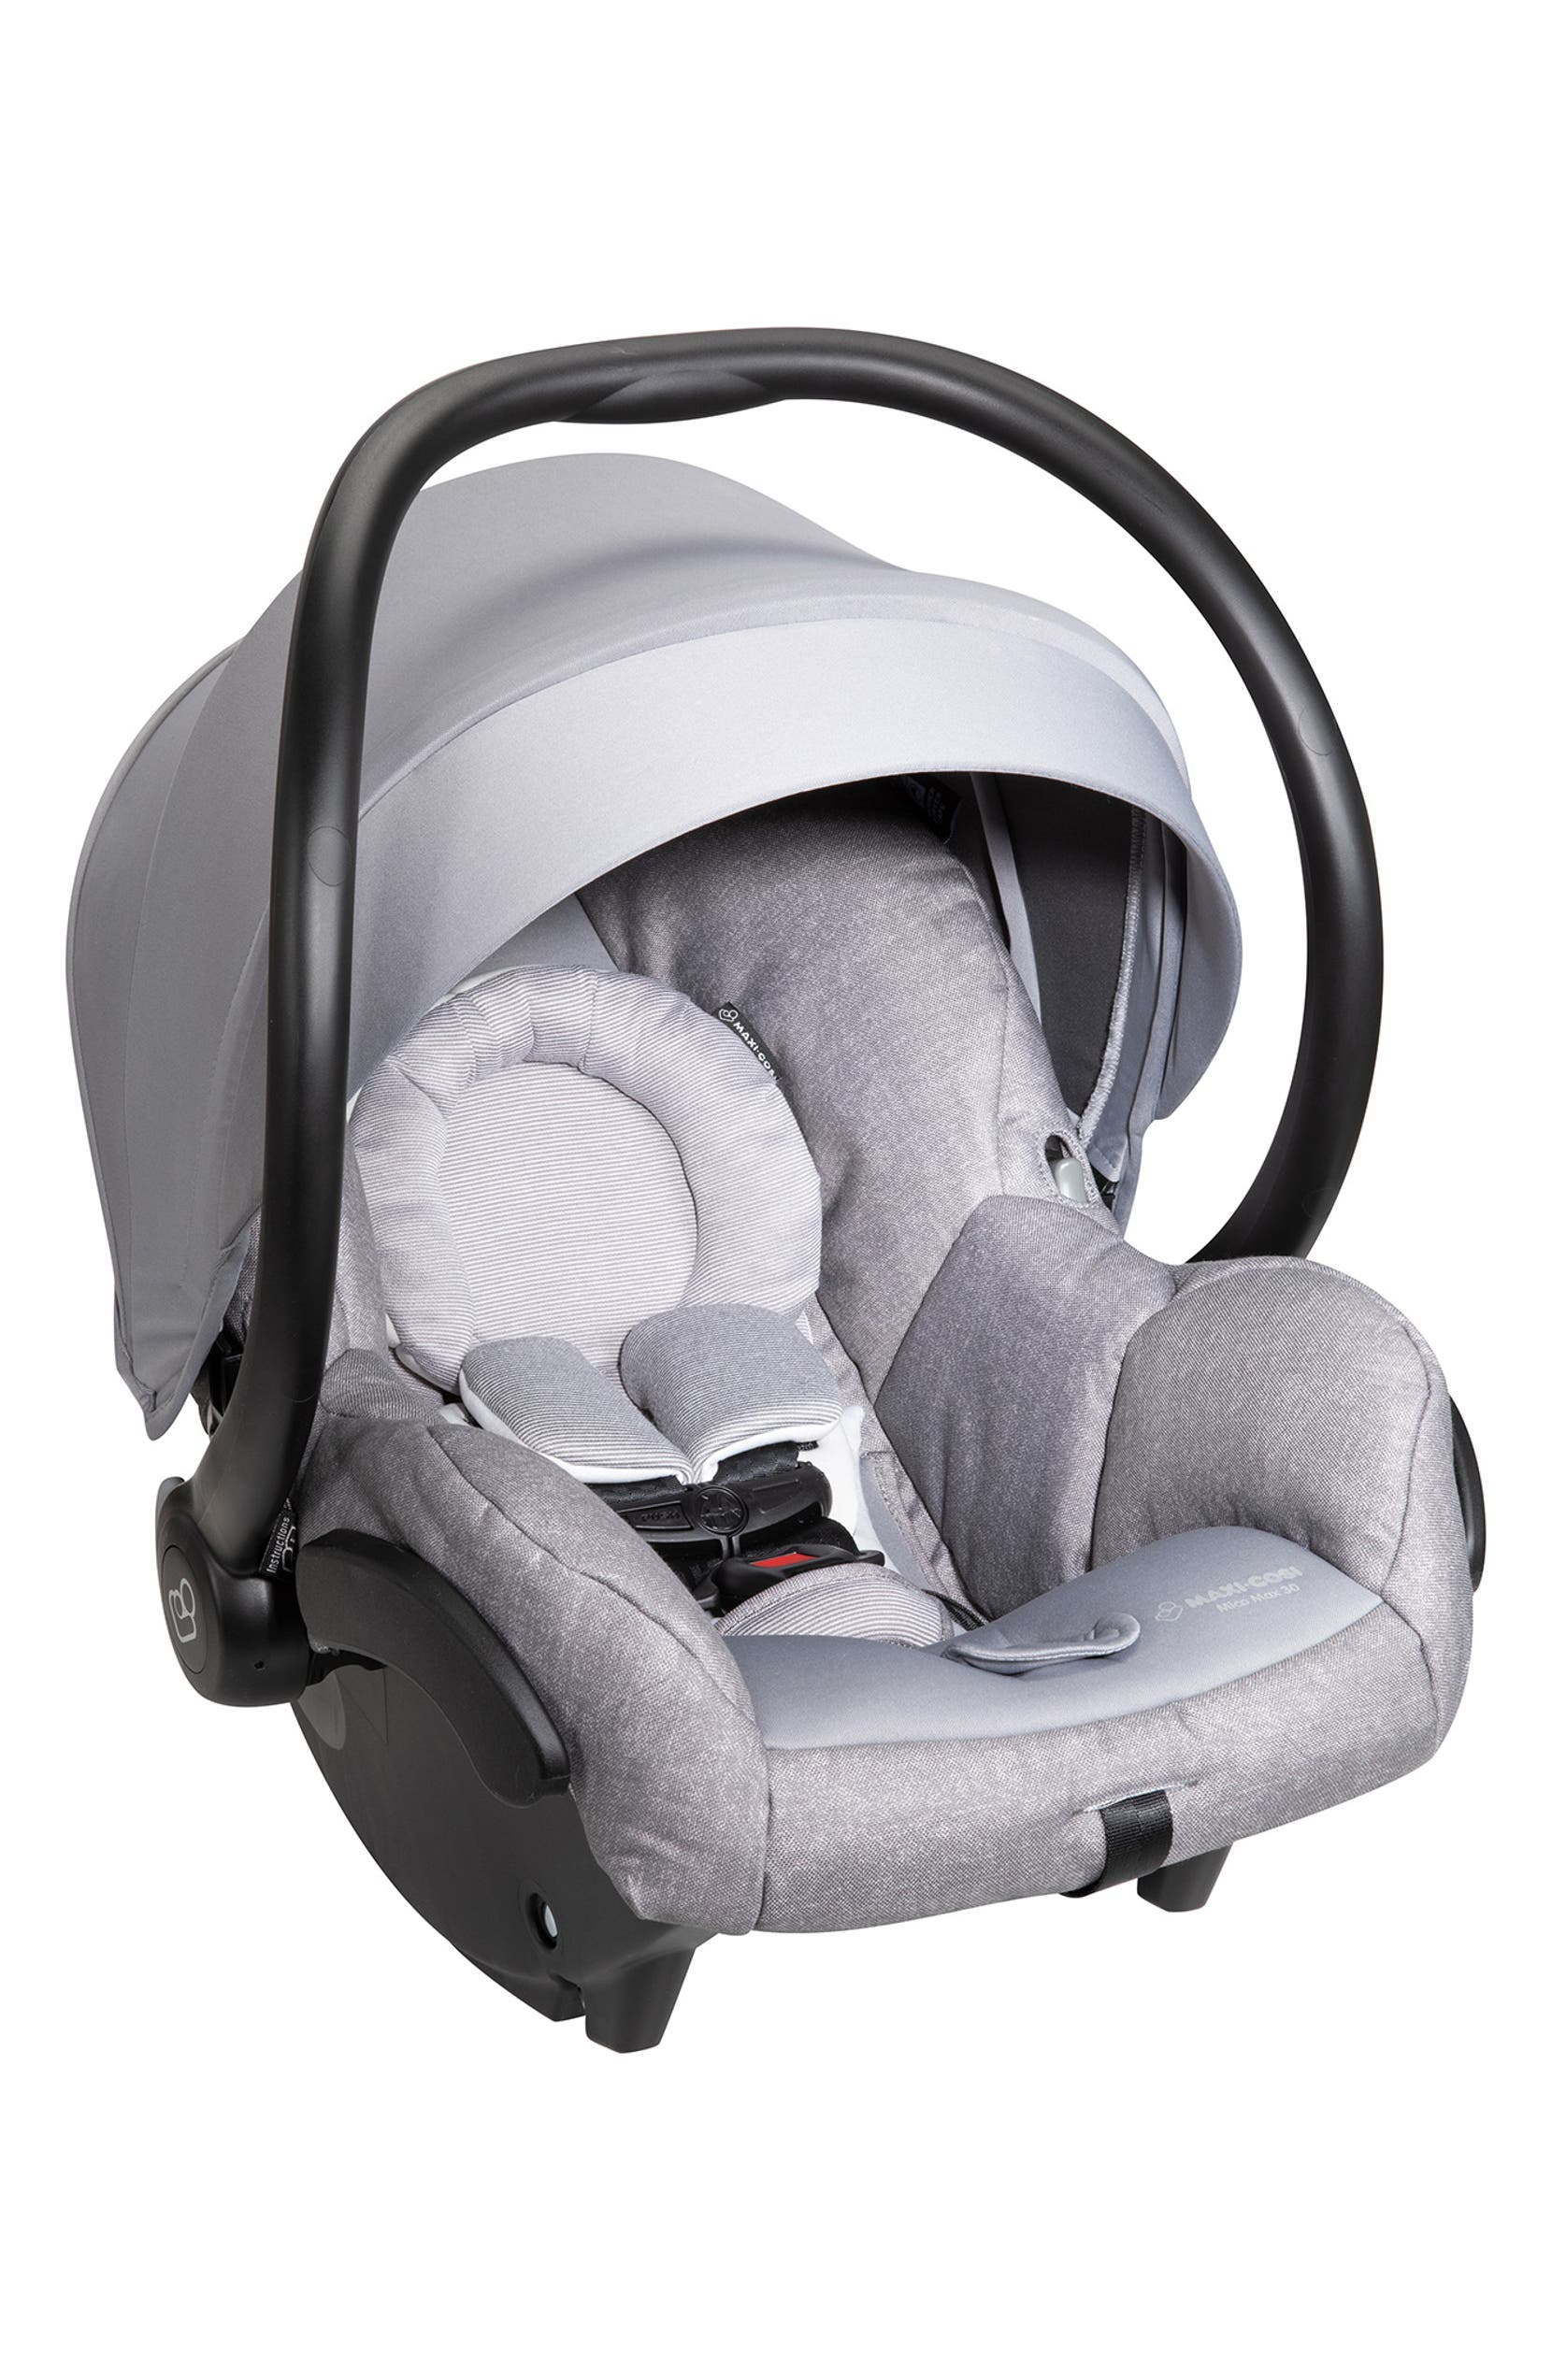 Mico Max 30 Infant Car Seat